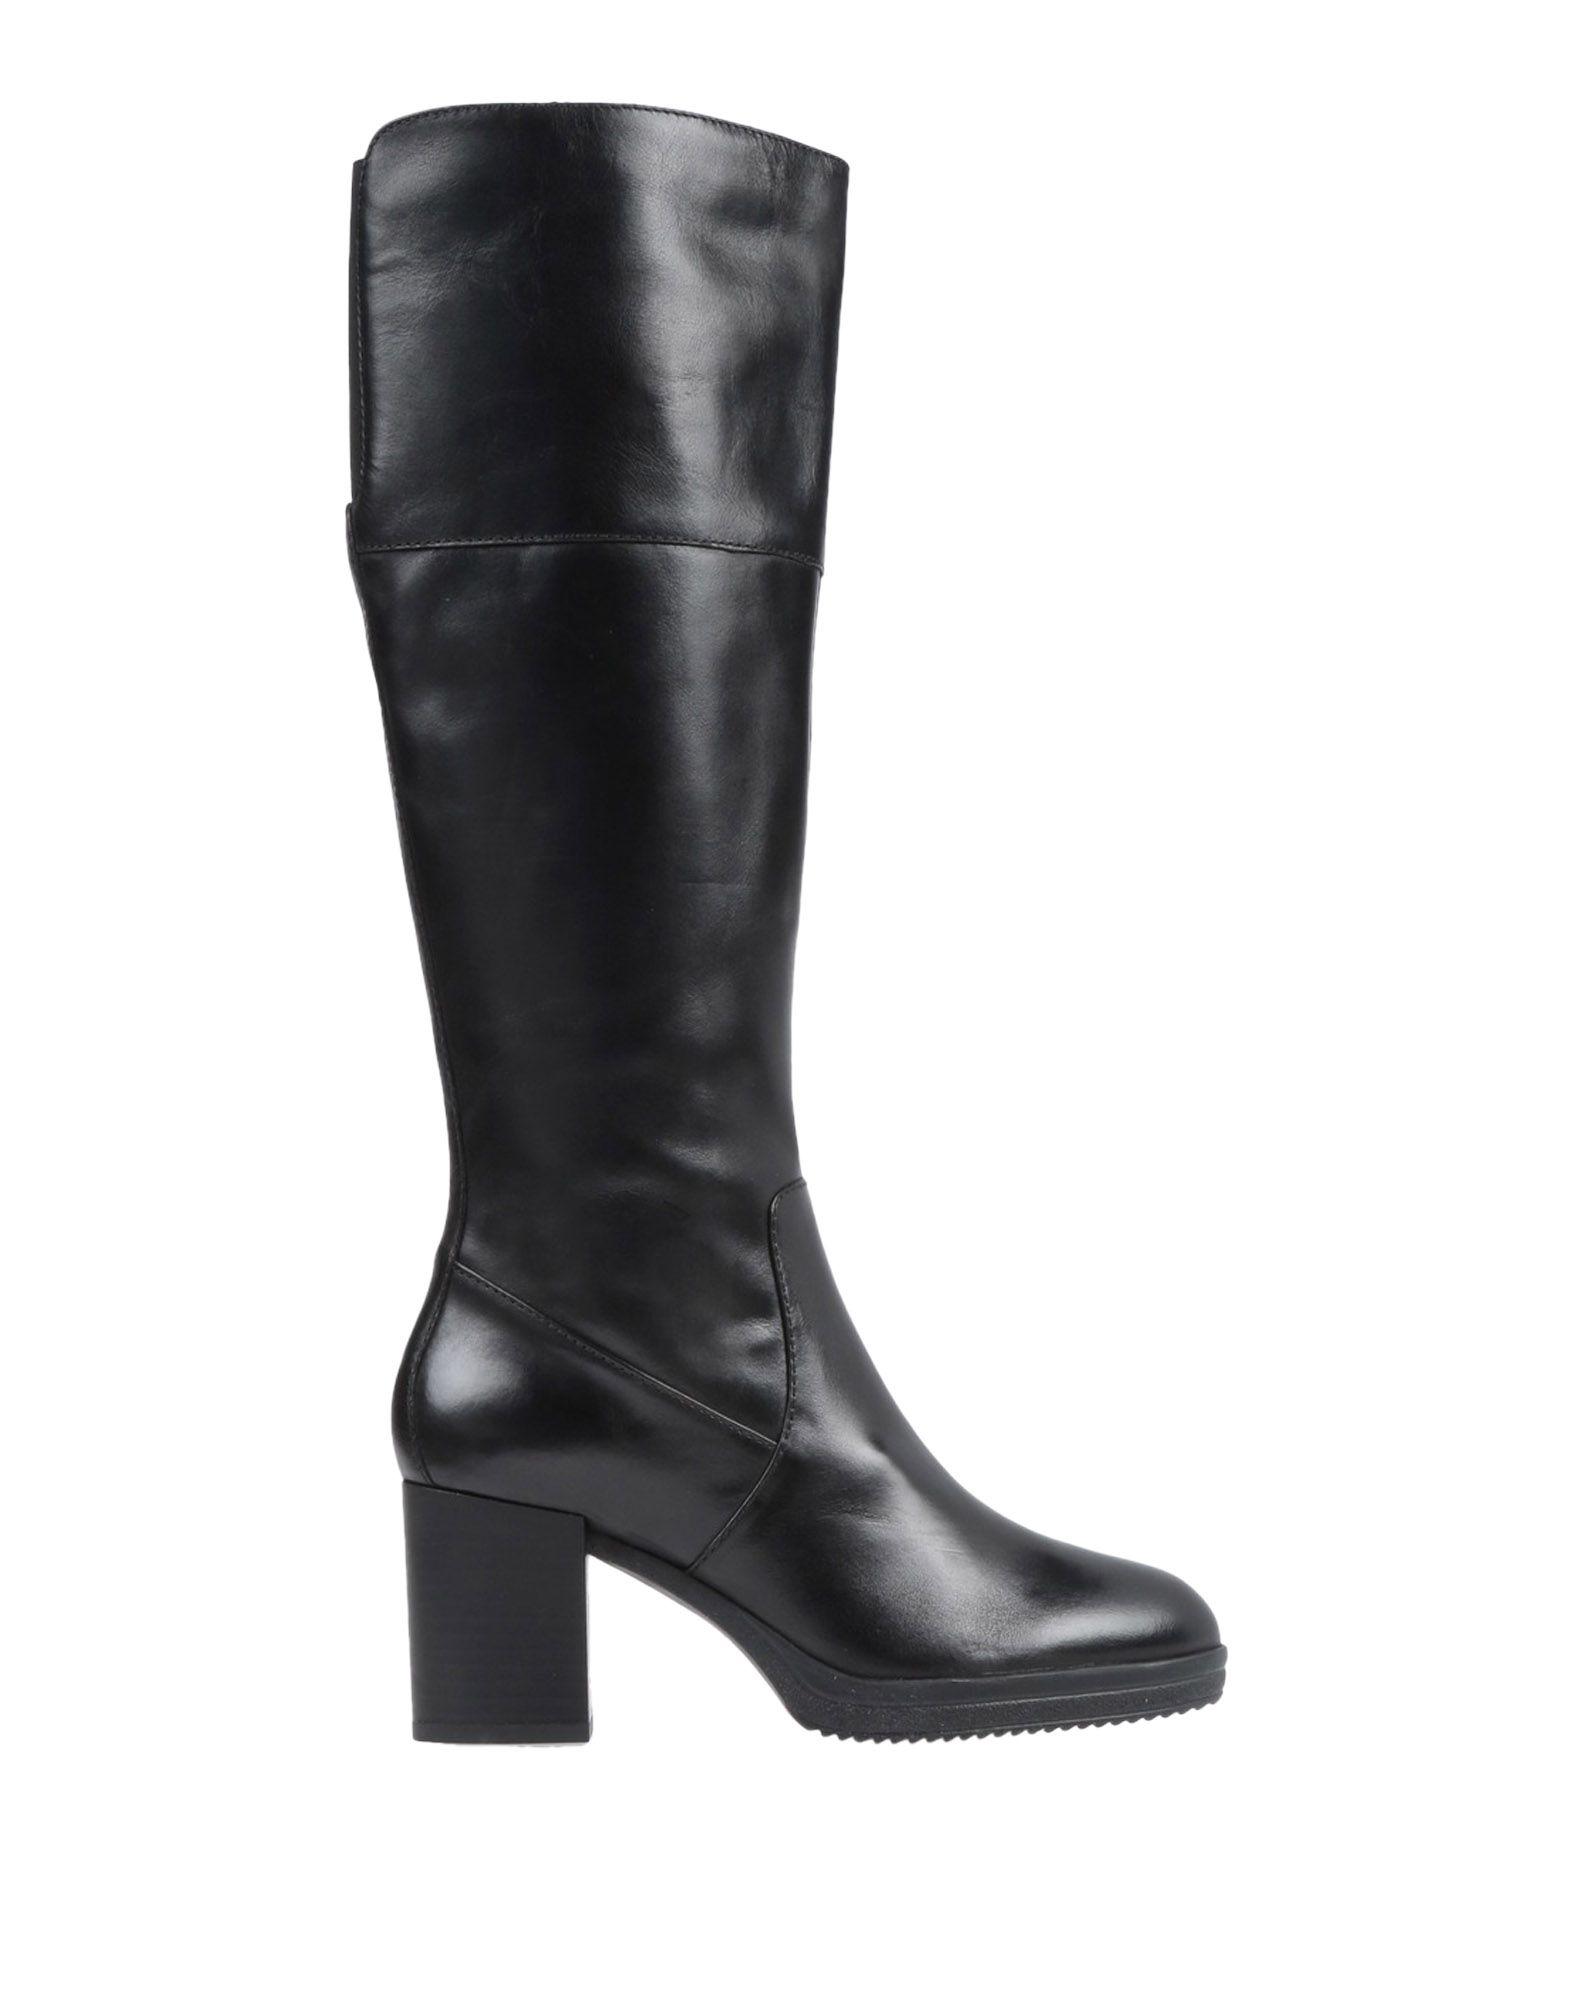 Geox Heiße Stiefel Damen  11541180LJ Heiße Geox Schuhe ffa792